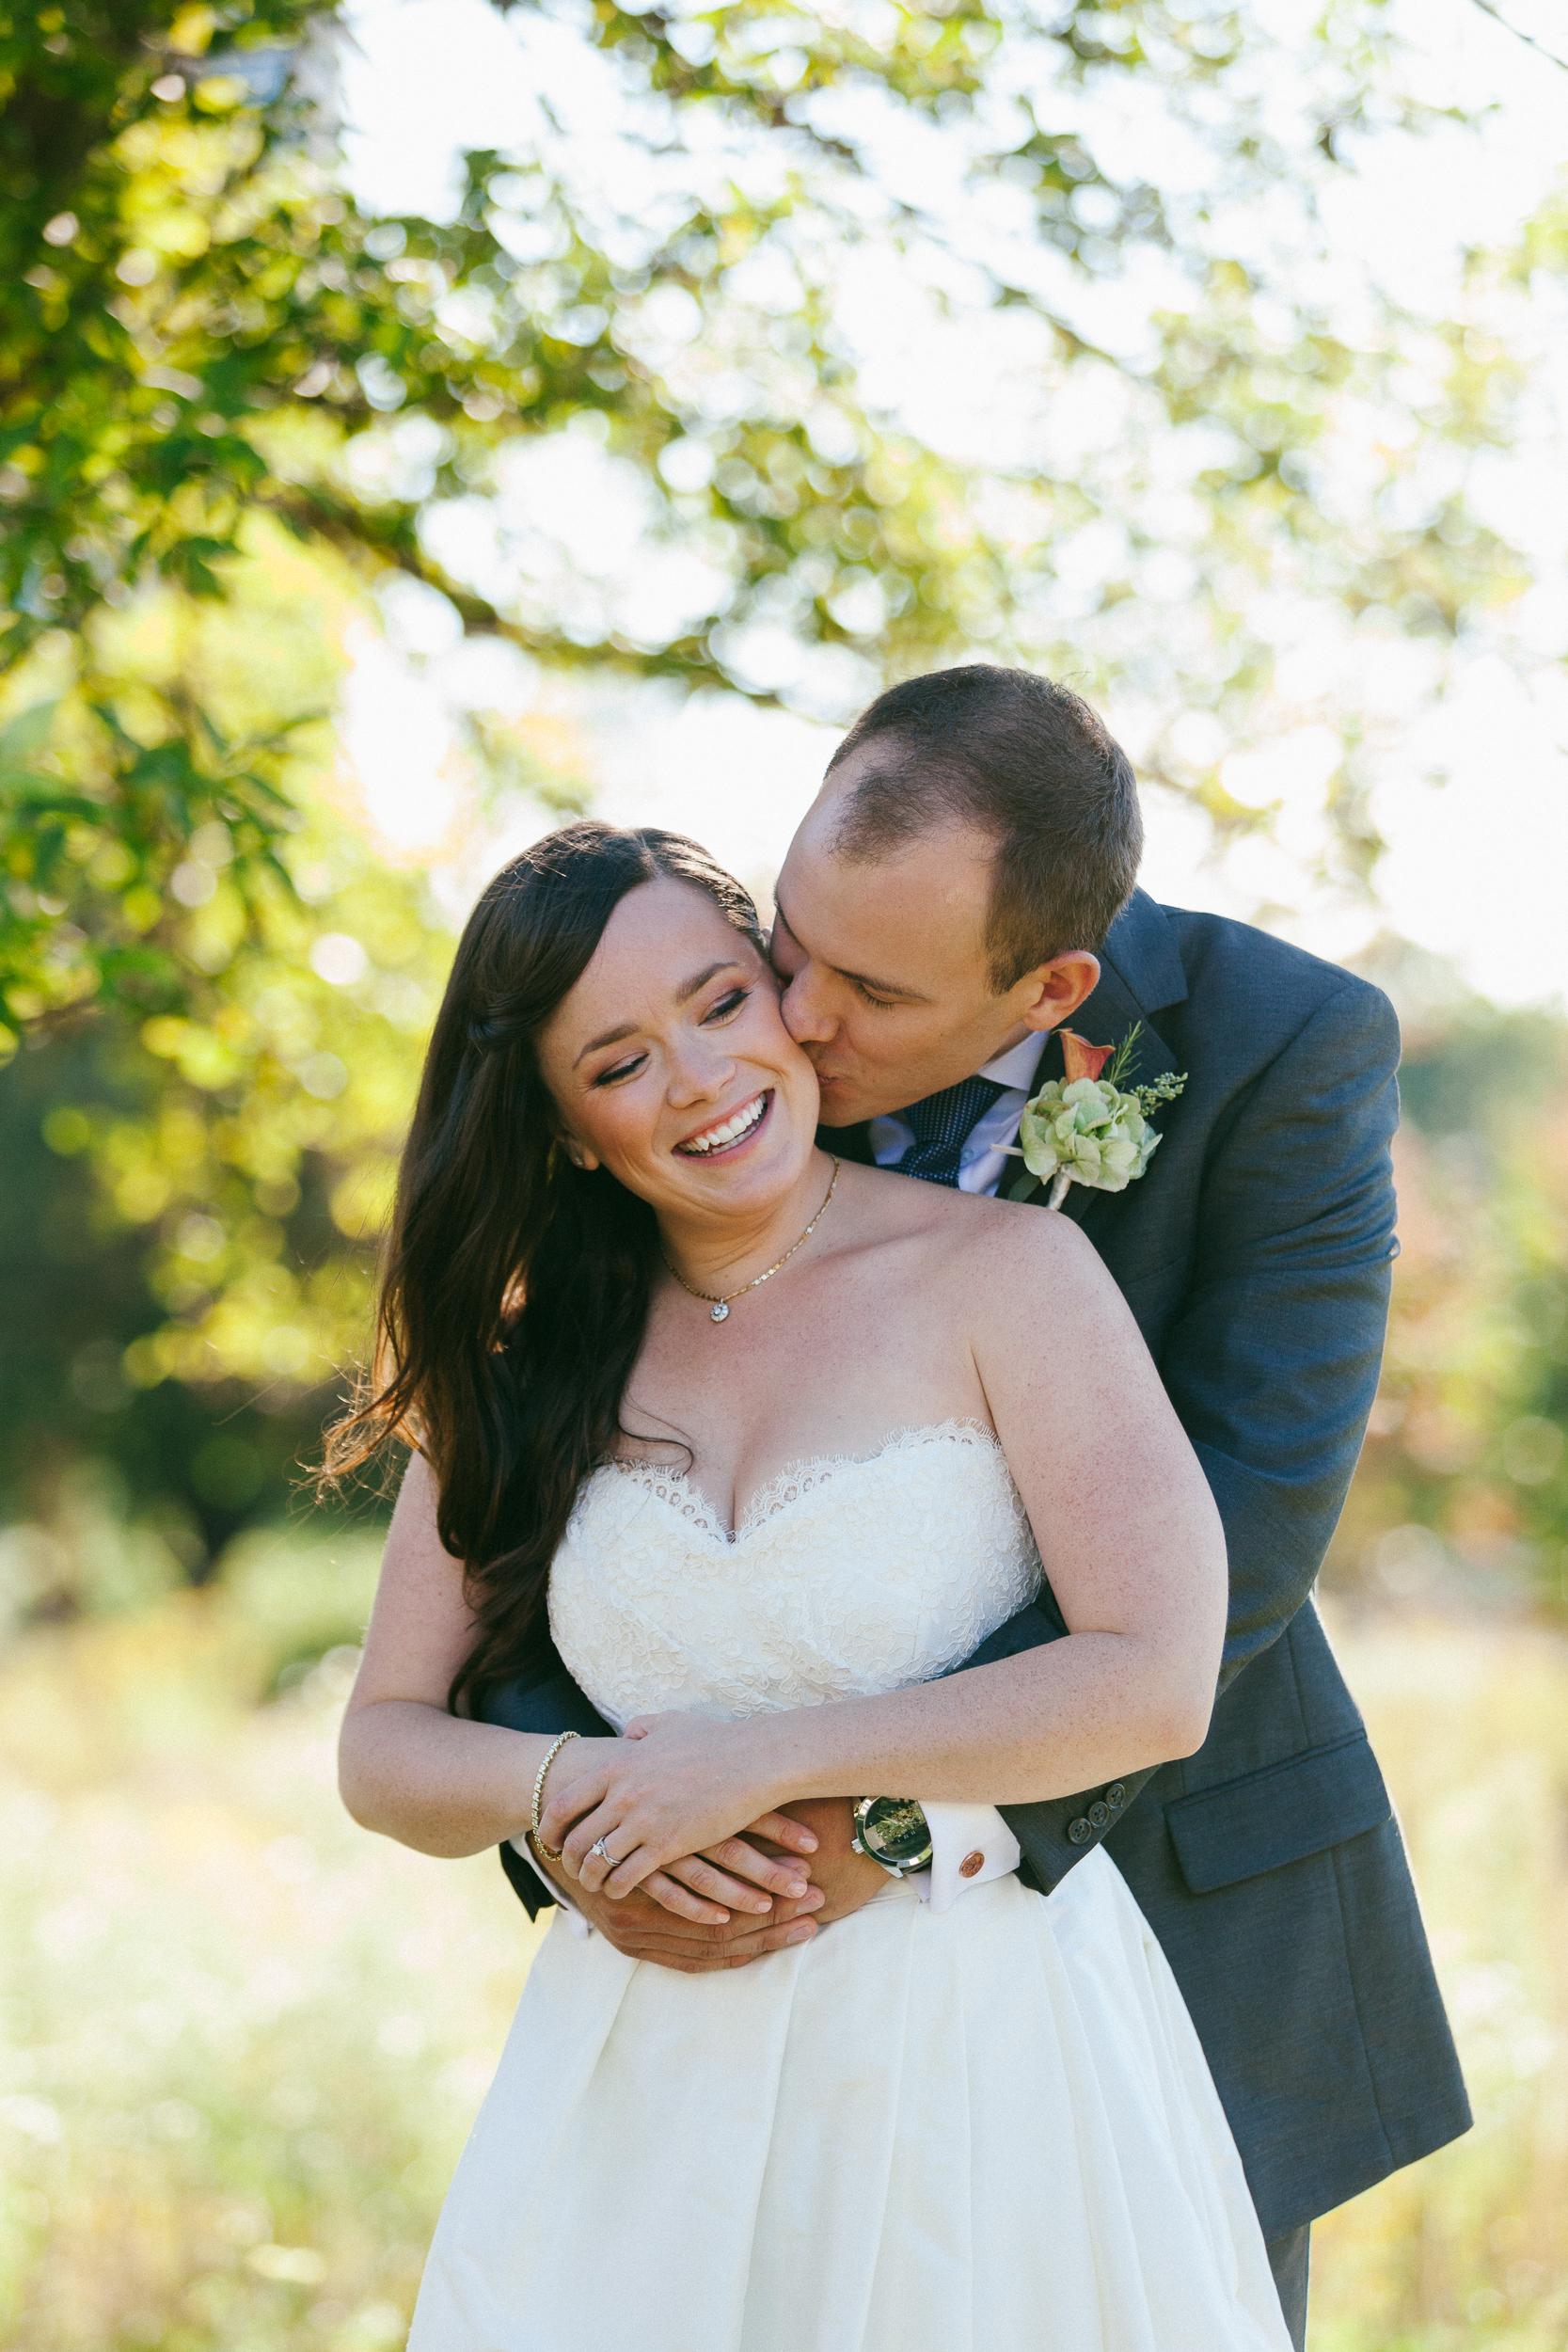 KarliCadel-Wedding-LaurenJake-408.jpg